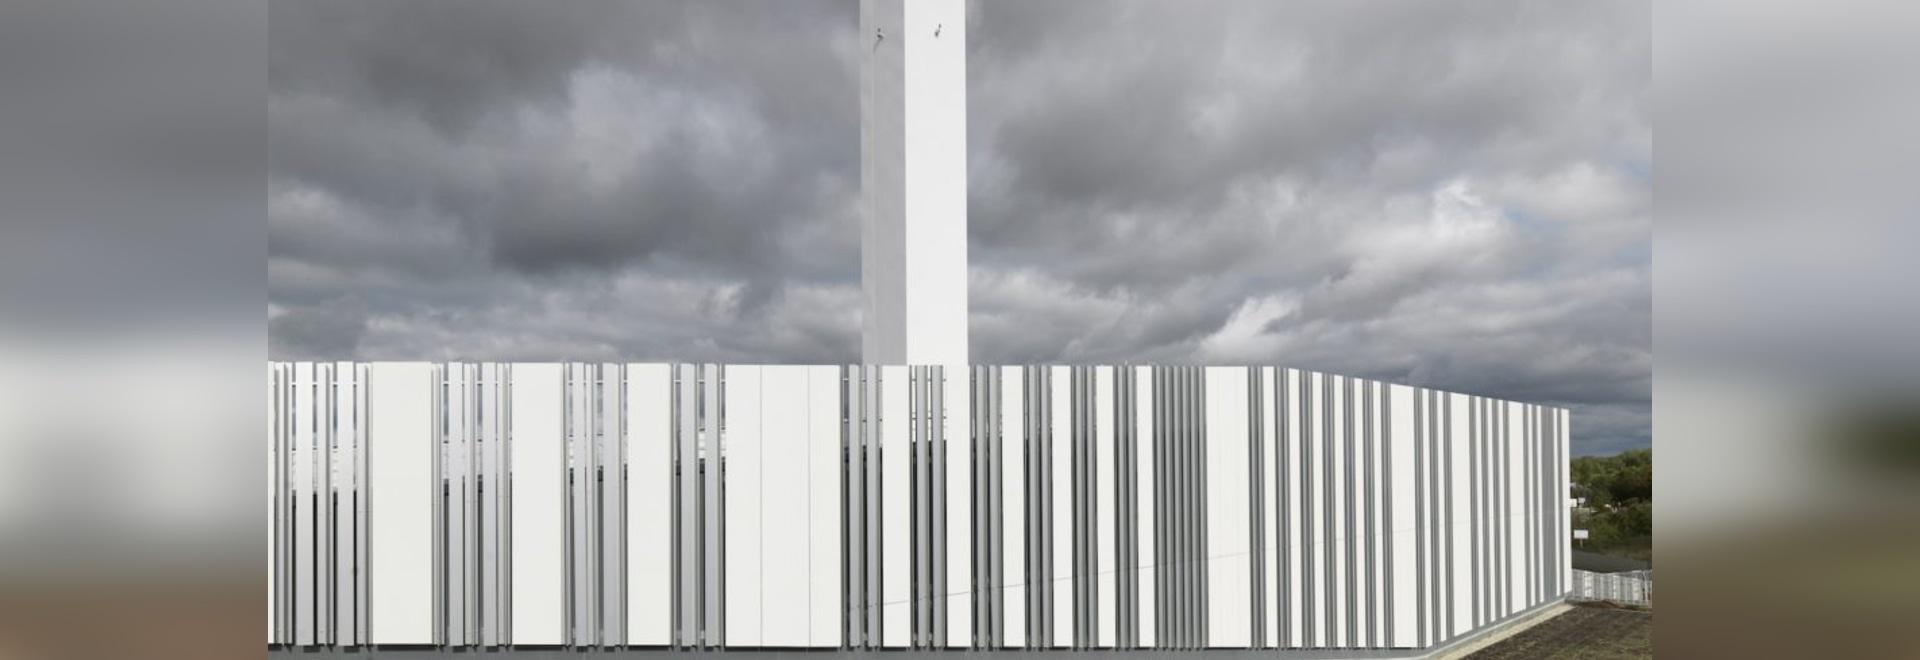 Reider's glass-fiber reinforced concrete panels are inherently fire retardant.